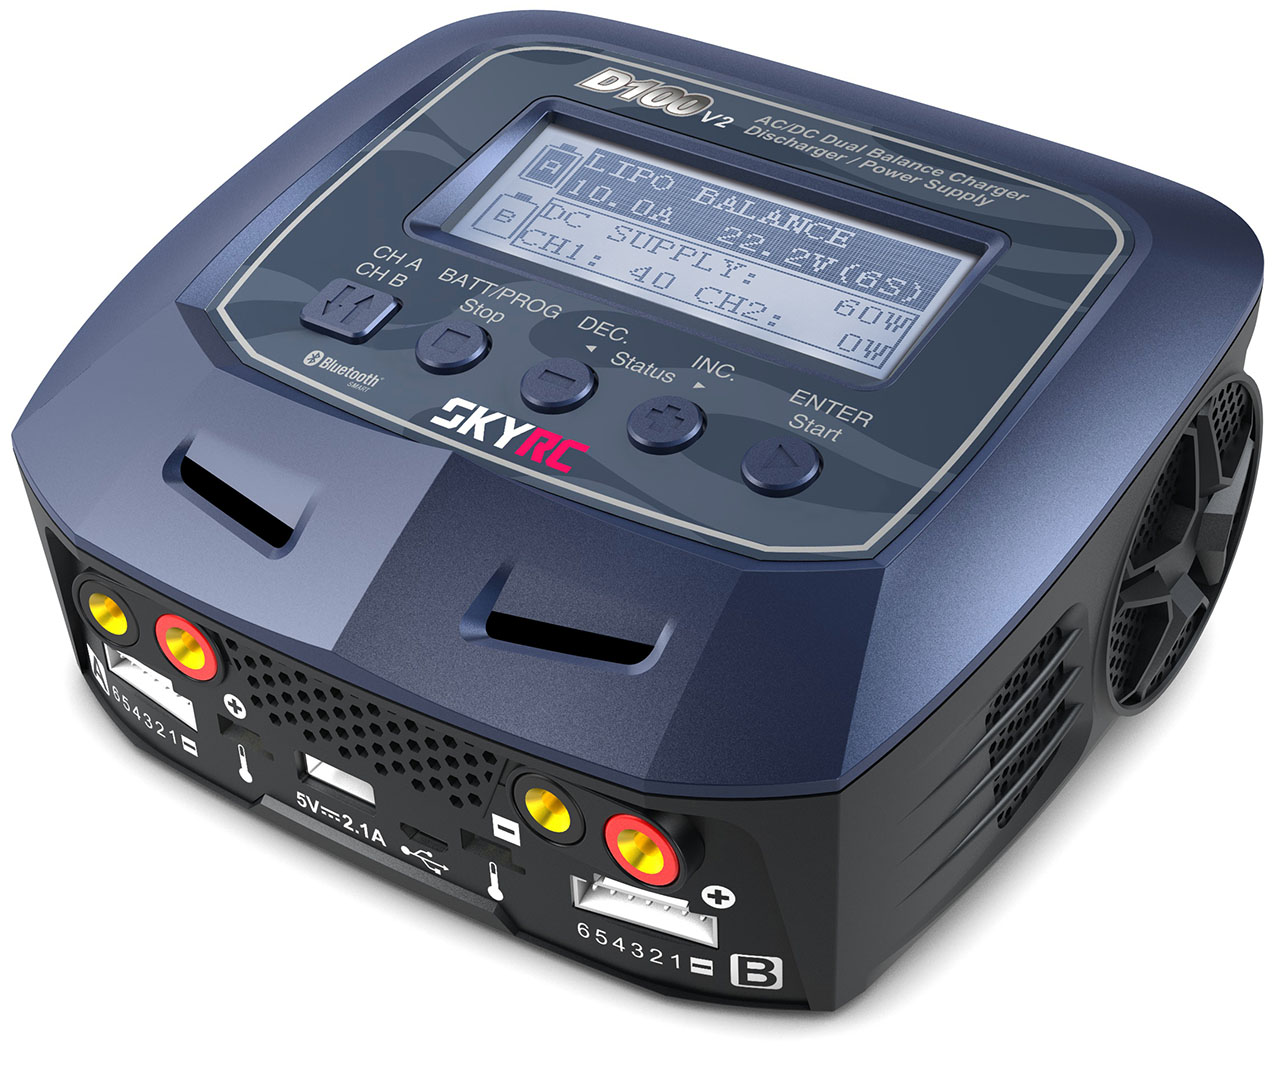 SKYRC Ladegerät Quattro Micro Battery Charger AC//DC 4x1s LiPo 1A